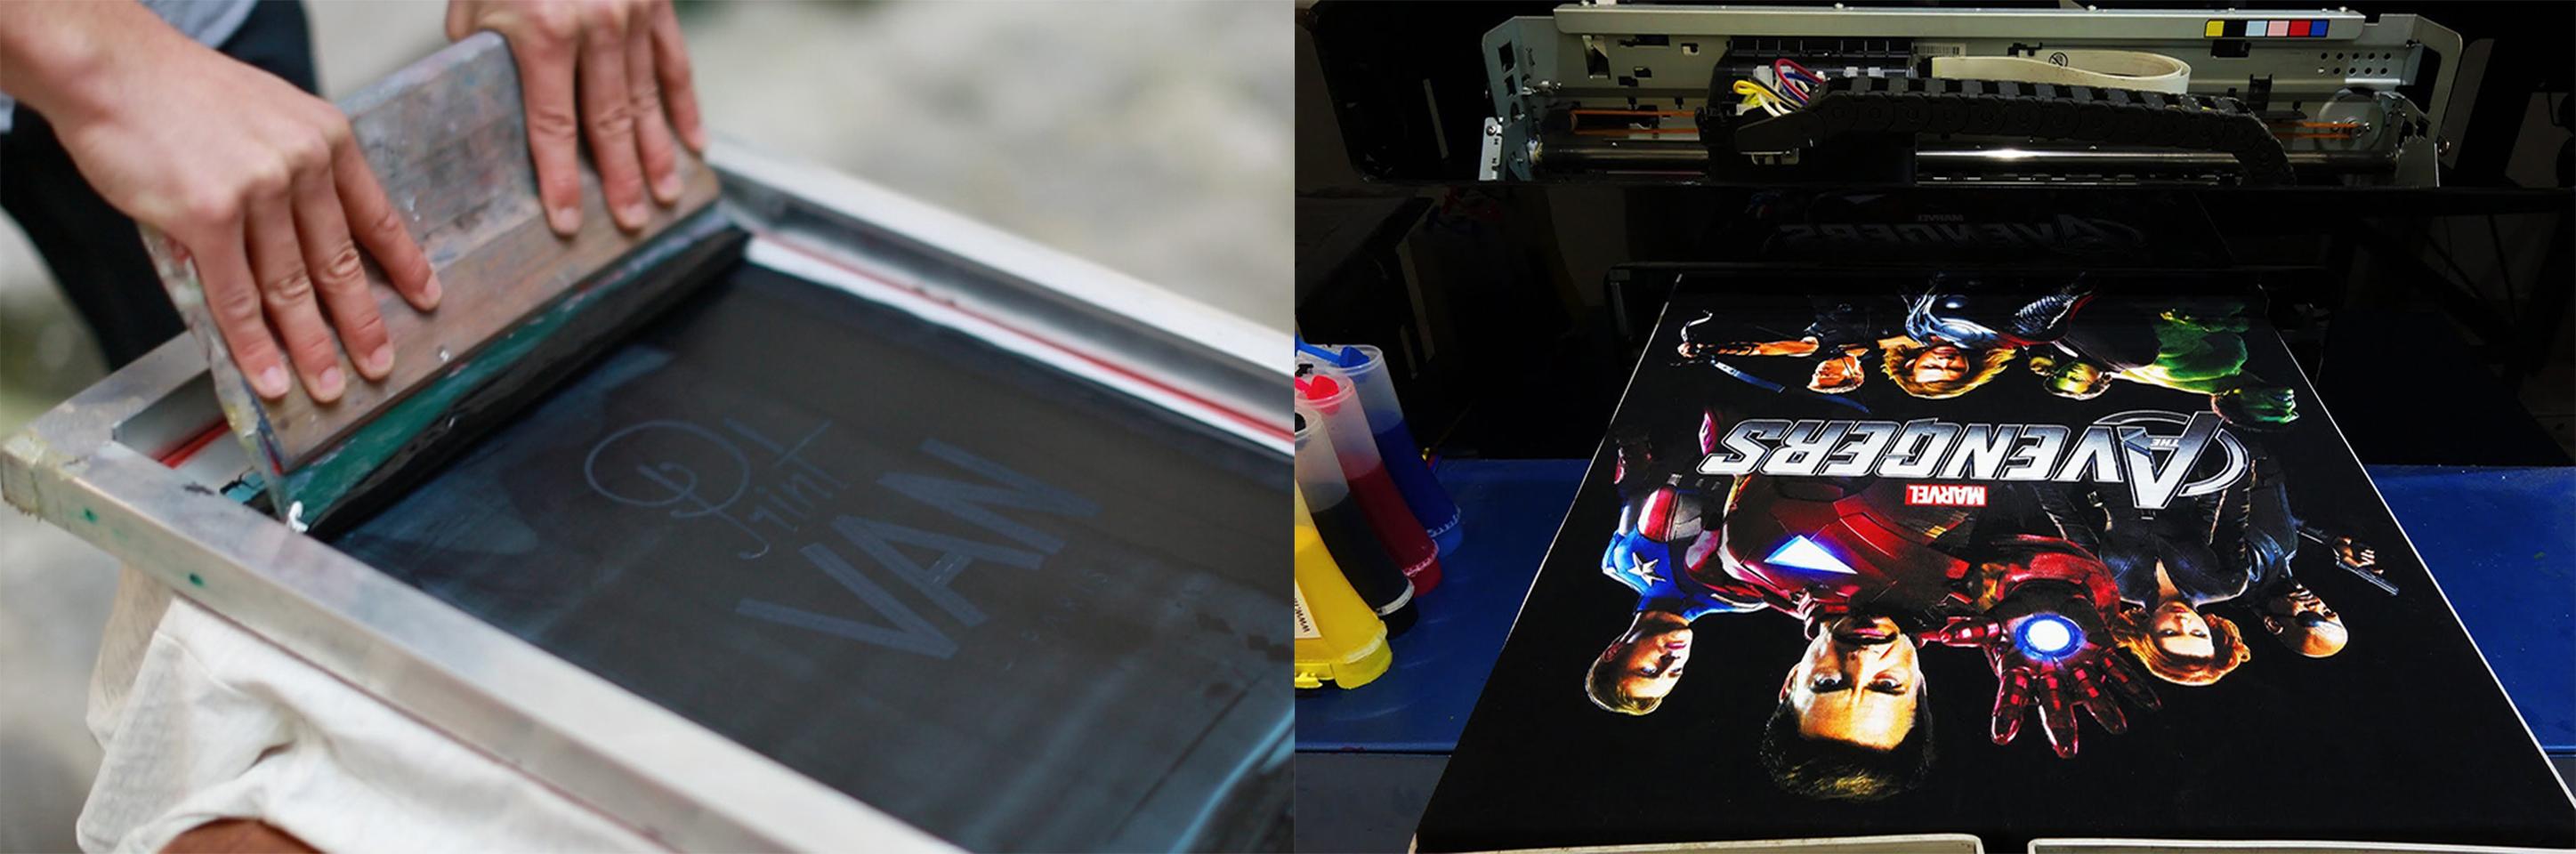 Digital Tshirt Printing Machines In South Africa